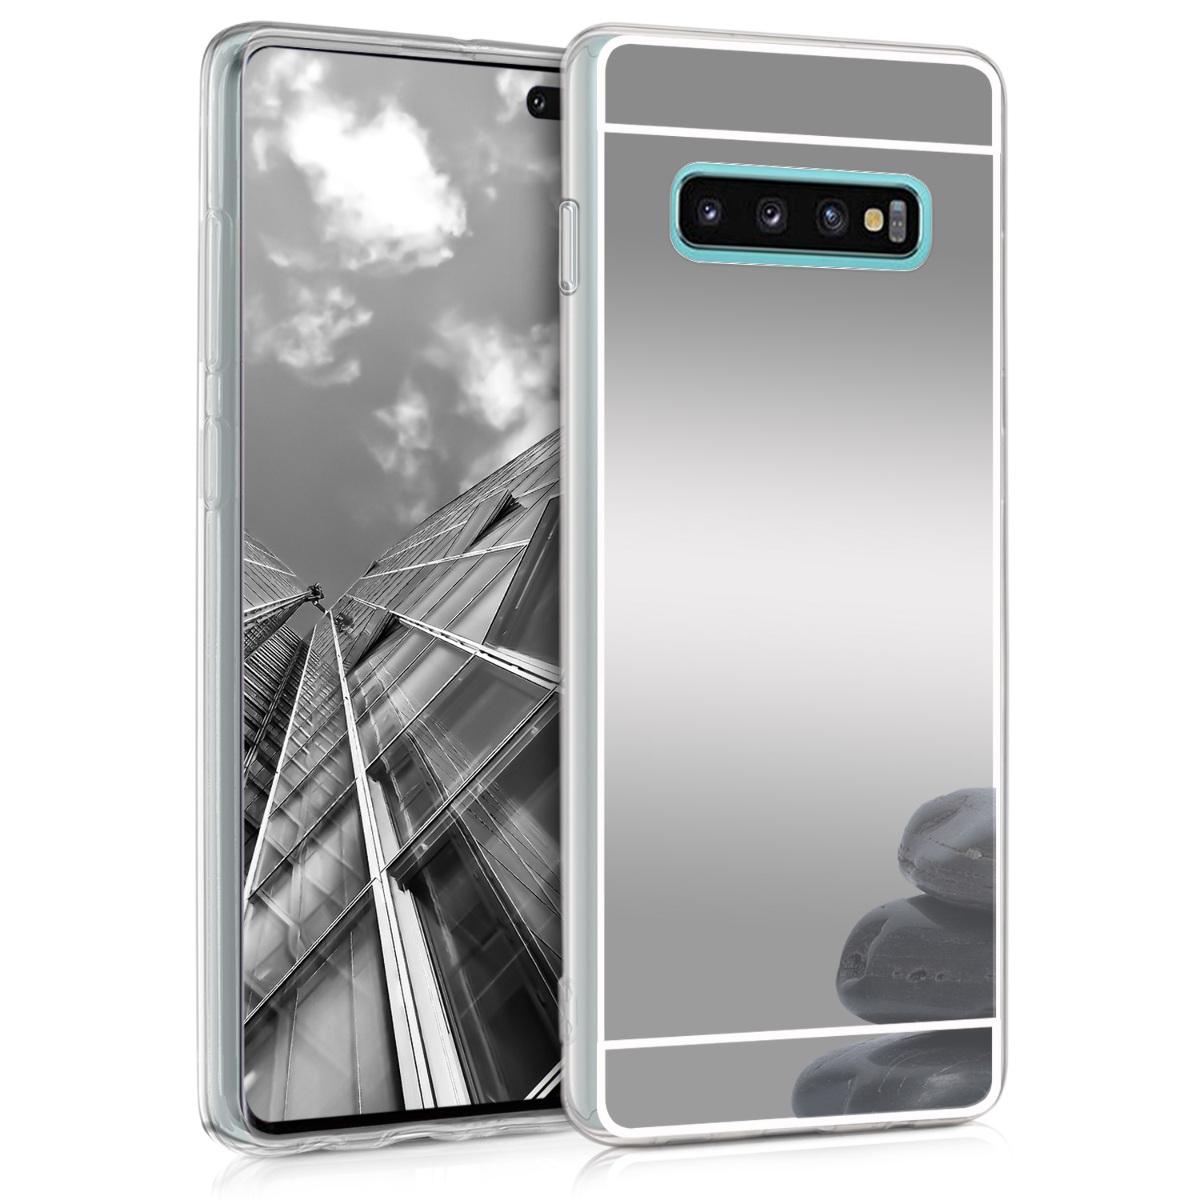 KW Θήκη Σιλικόνης (TPU) με Καθρέφτη Samsung Galaxy S10 Plus - Silver Reflective (47938.42)